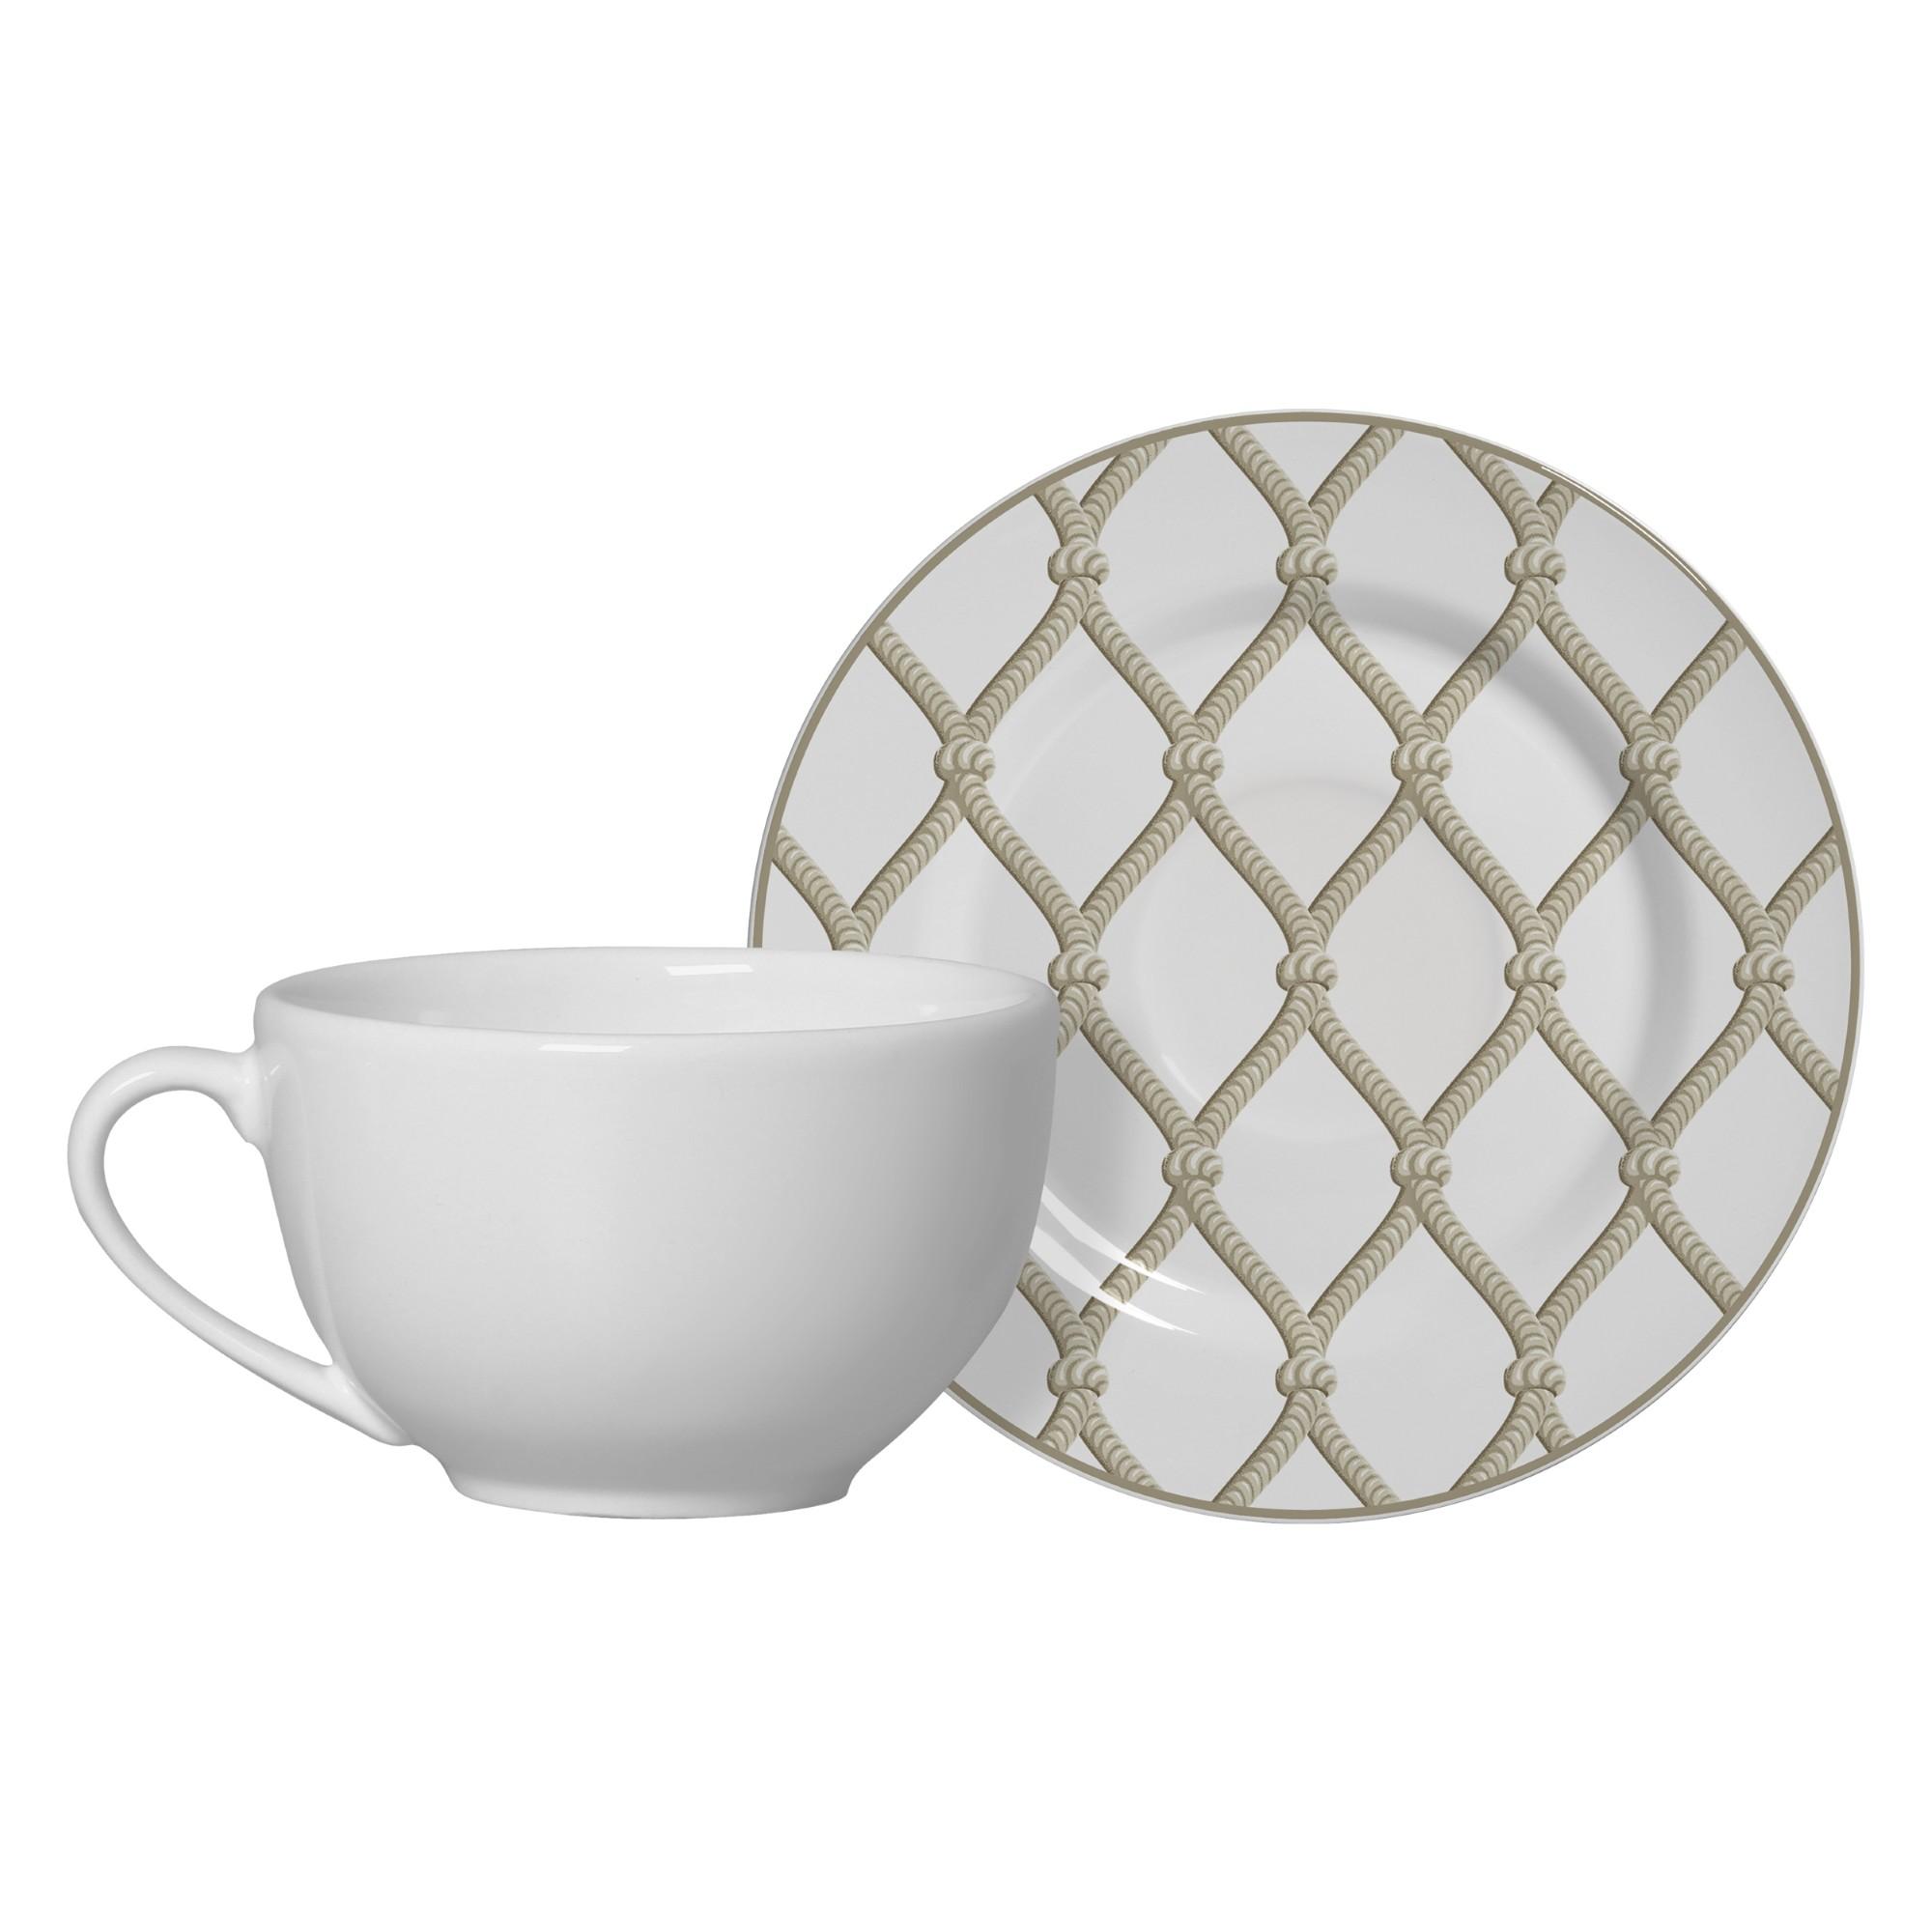 Xicara de Cha de Ceramica 300ml com Pires Nautica - Alleanza